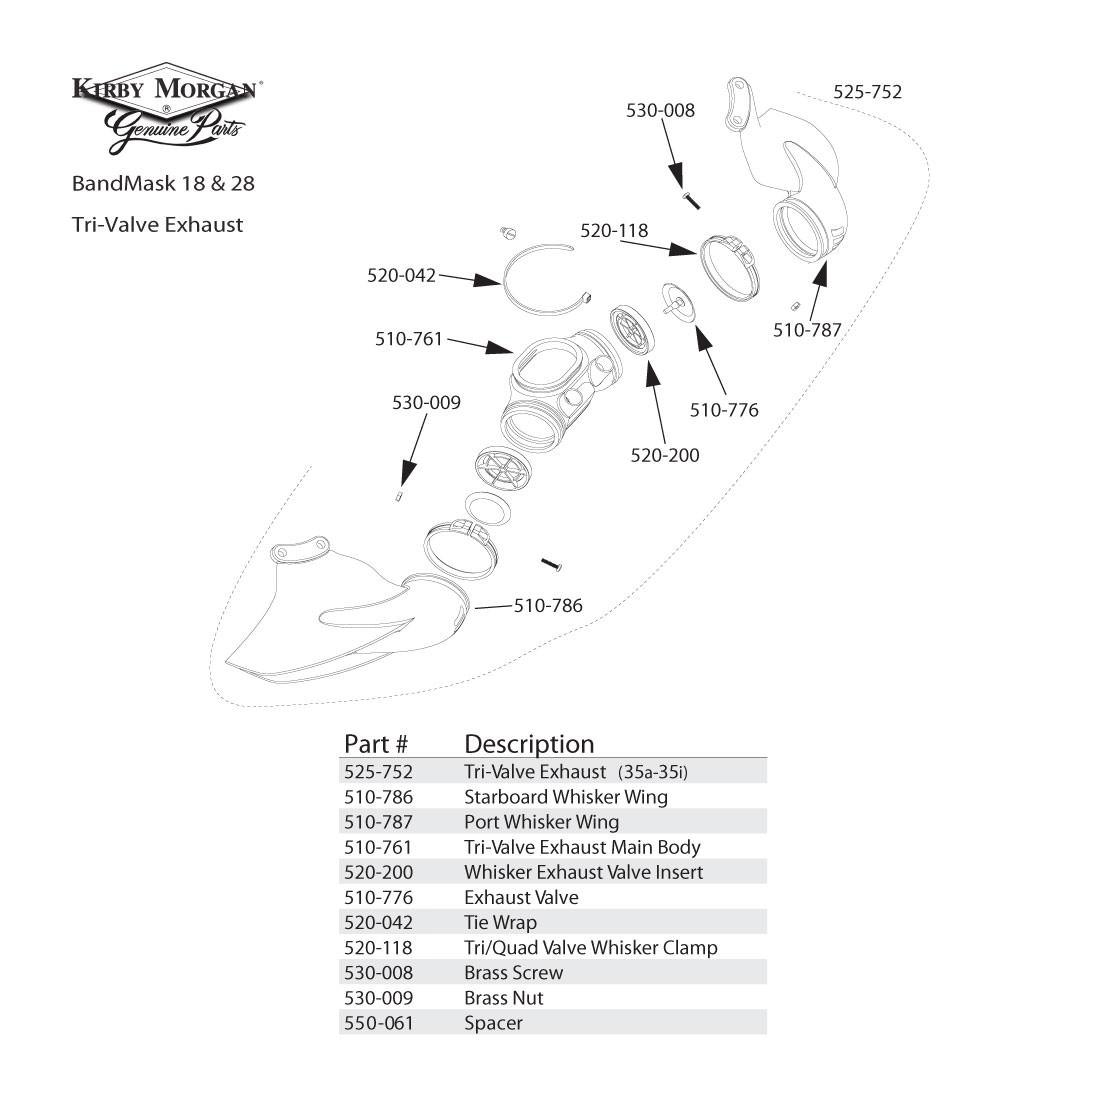 Kirby Morgan BandMask 28 - Tri-Valve Exhaust Breakout